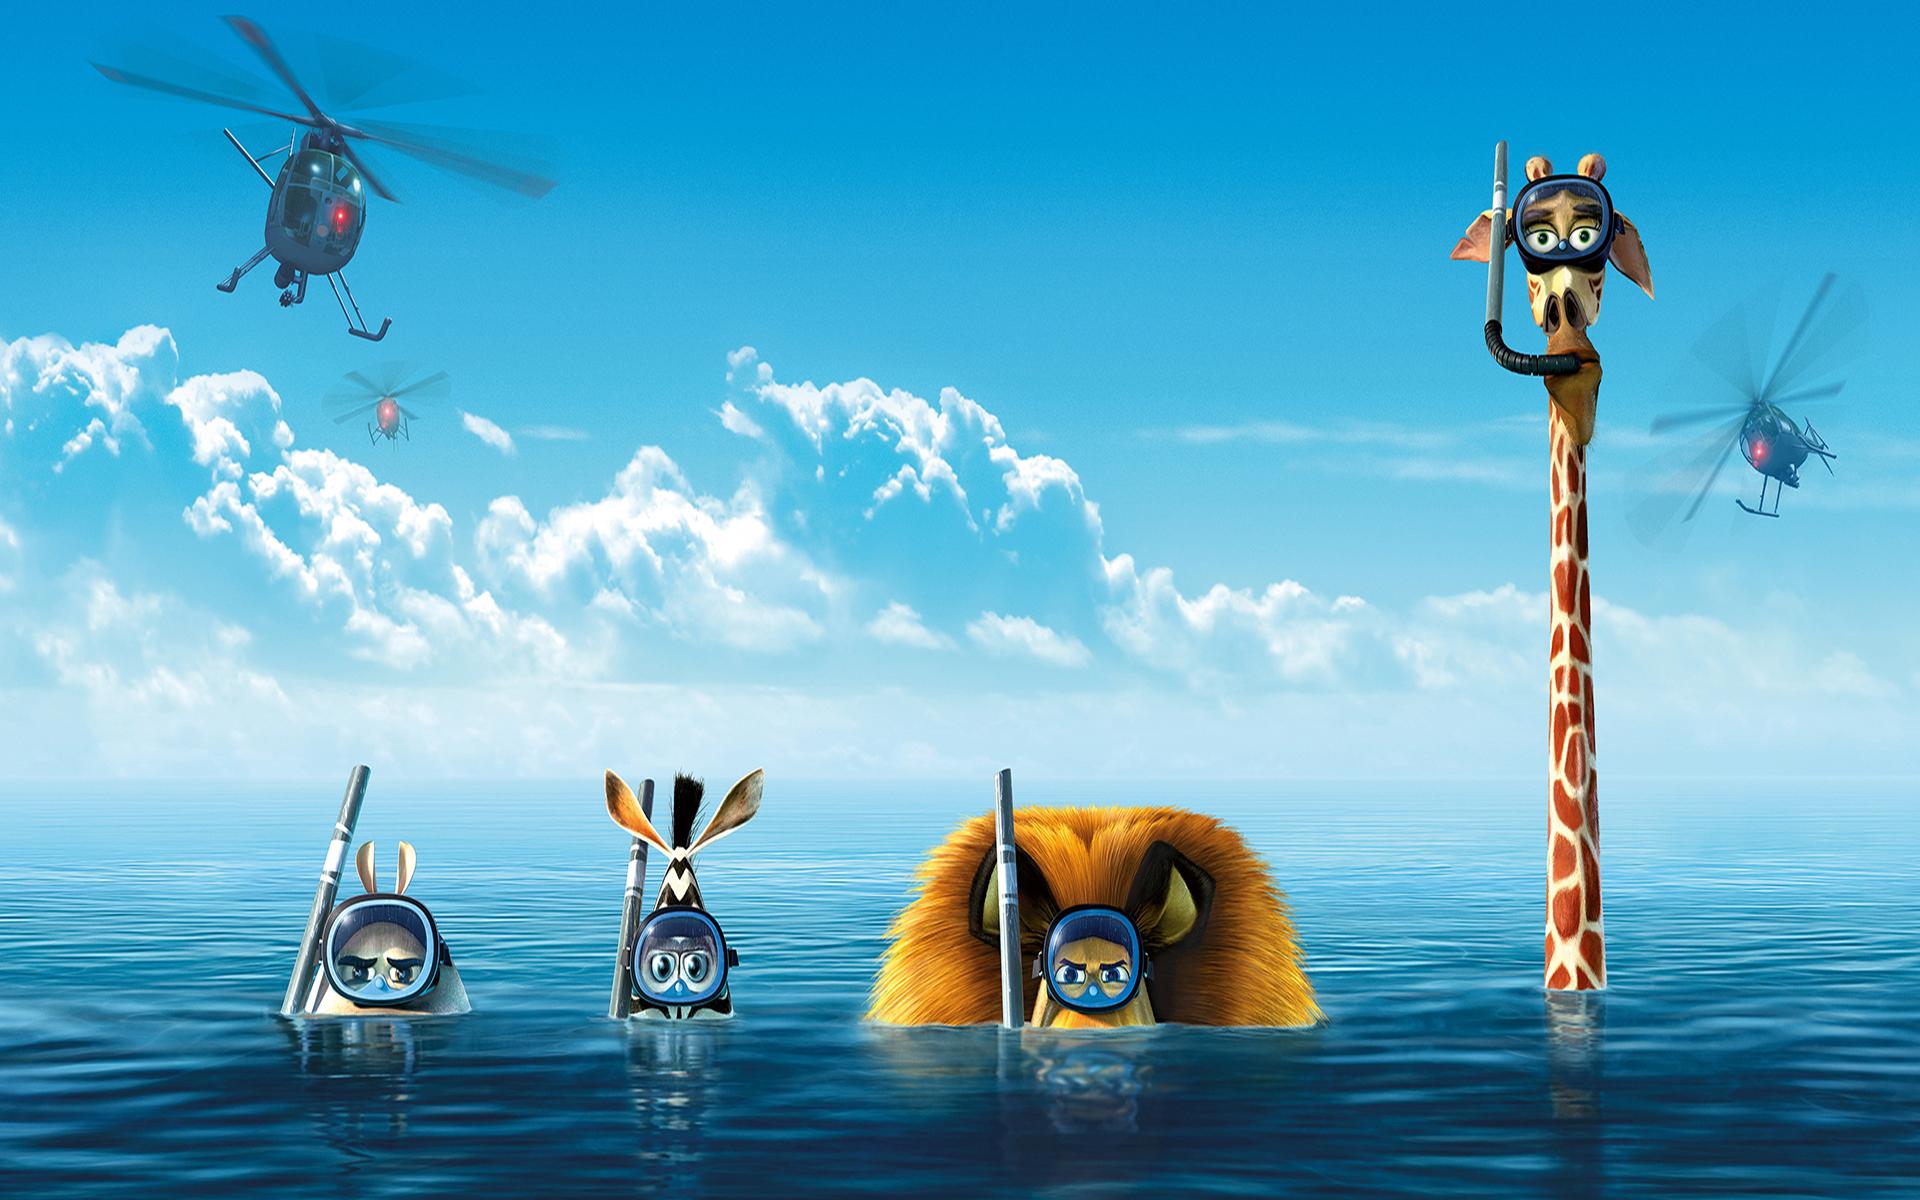 wallpaper de Madagascar 3